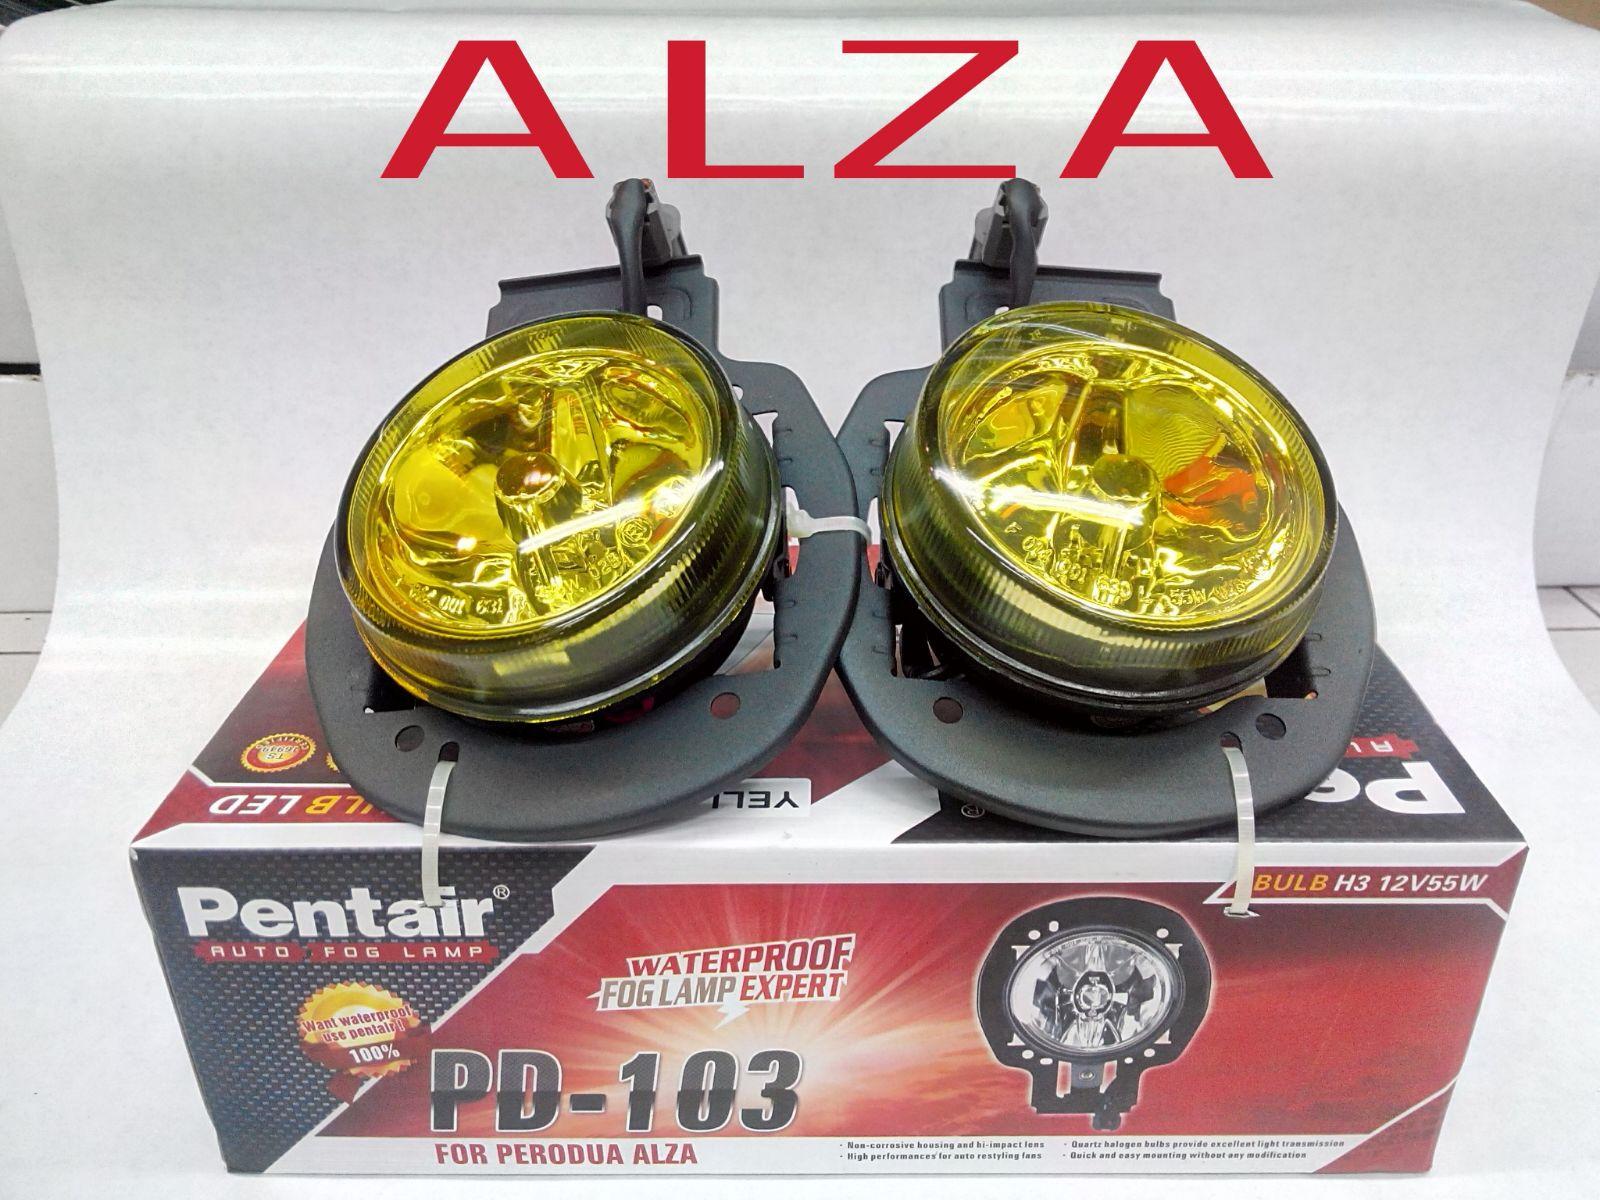 Alza Old fog lamp | Shah Alam Car Accessories